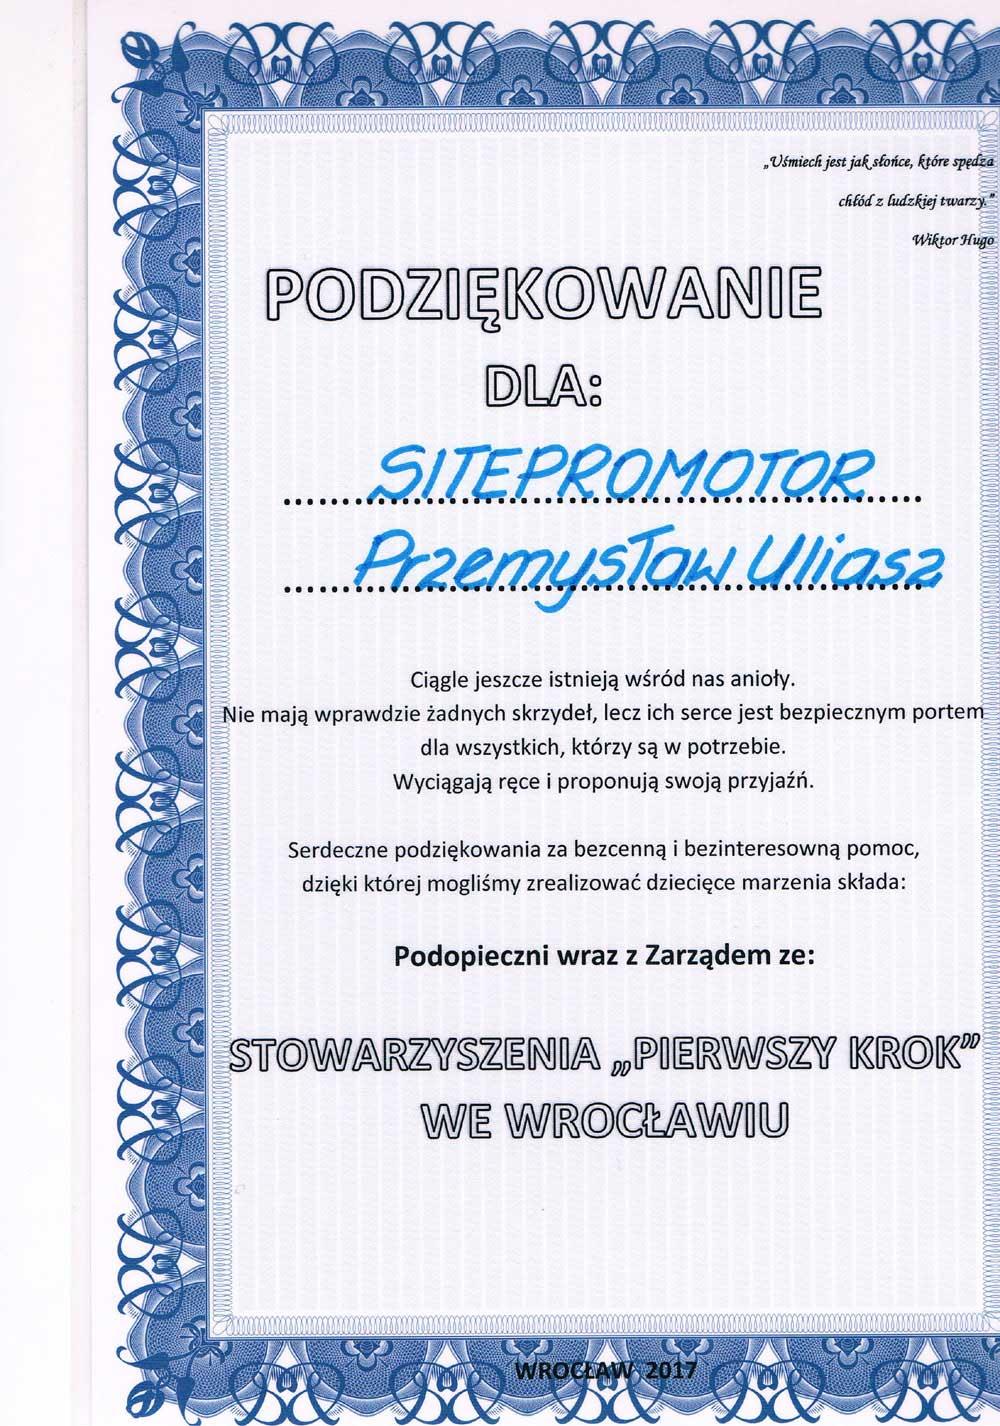 SitePromotor (sitepromotor) na Pintereście